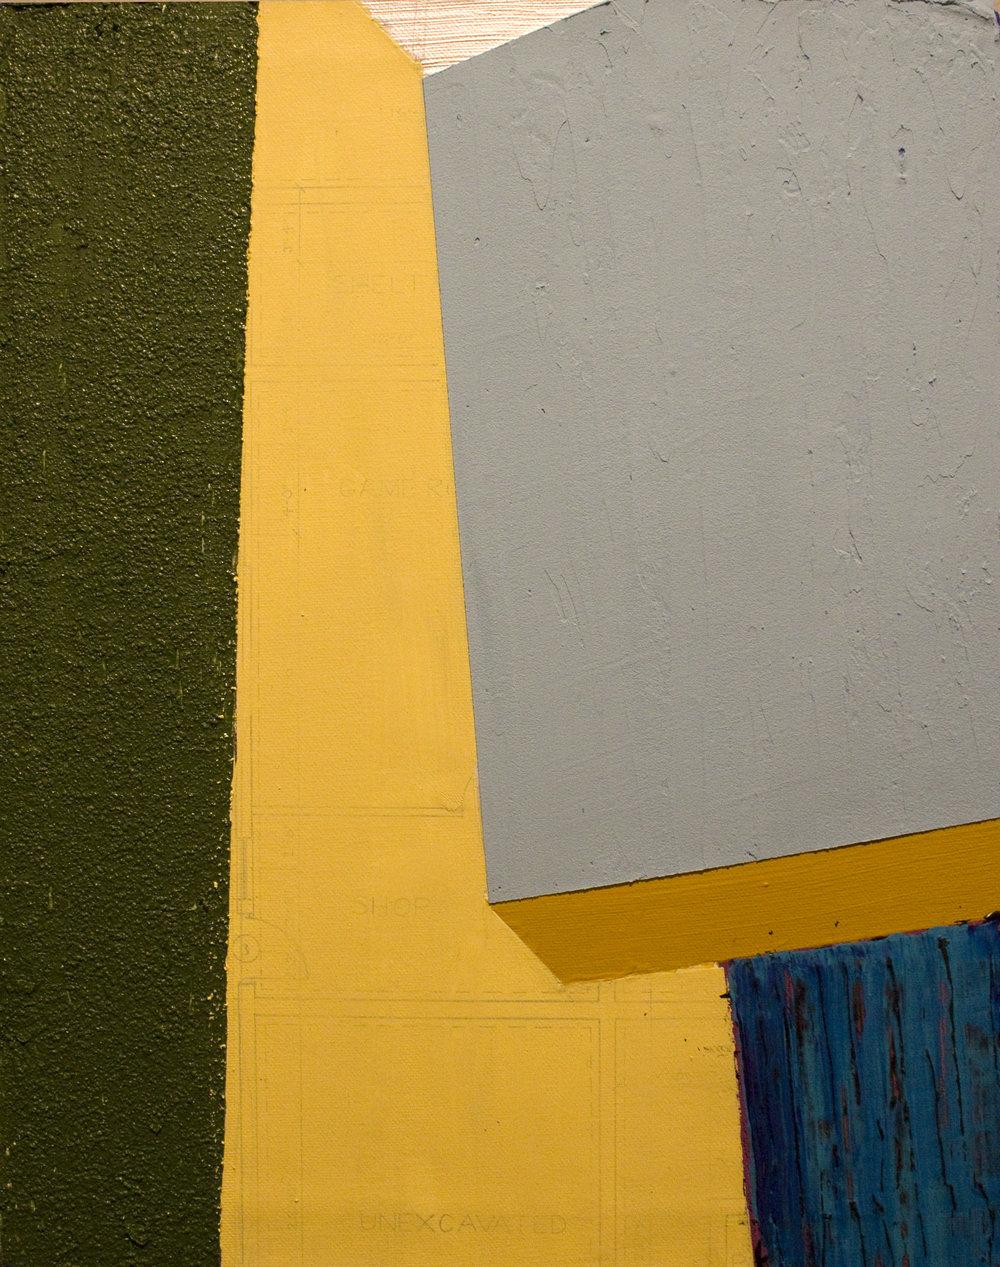 9 Painting.jpg